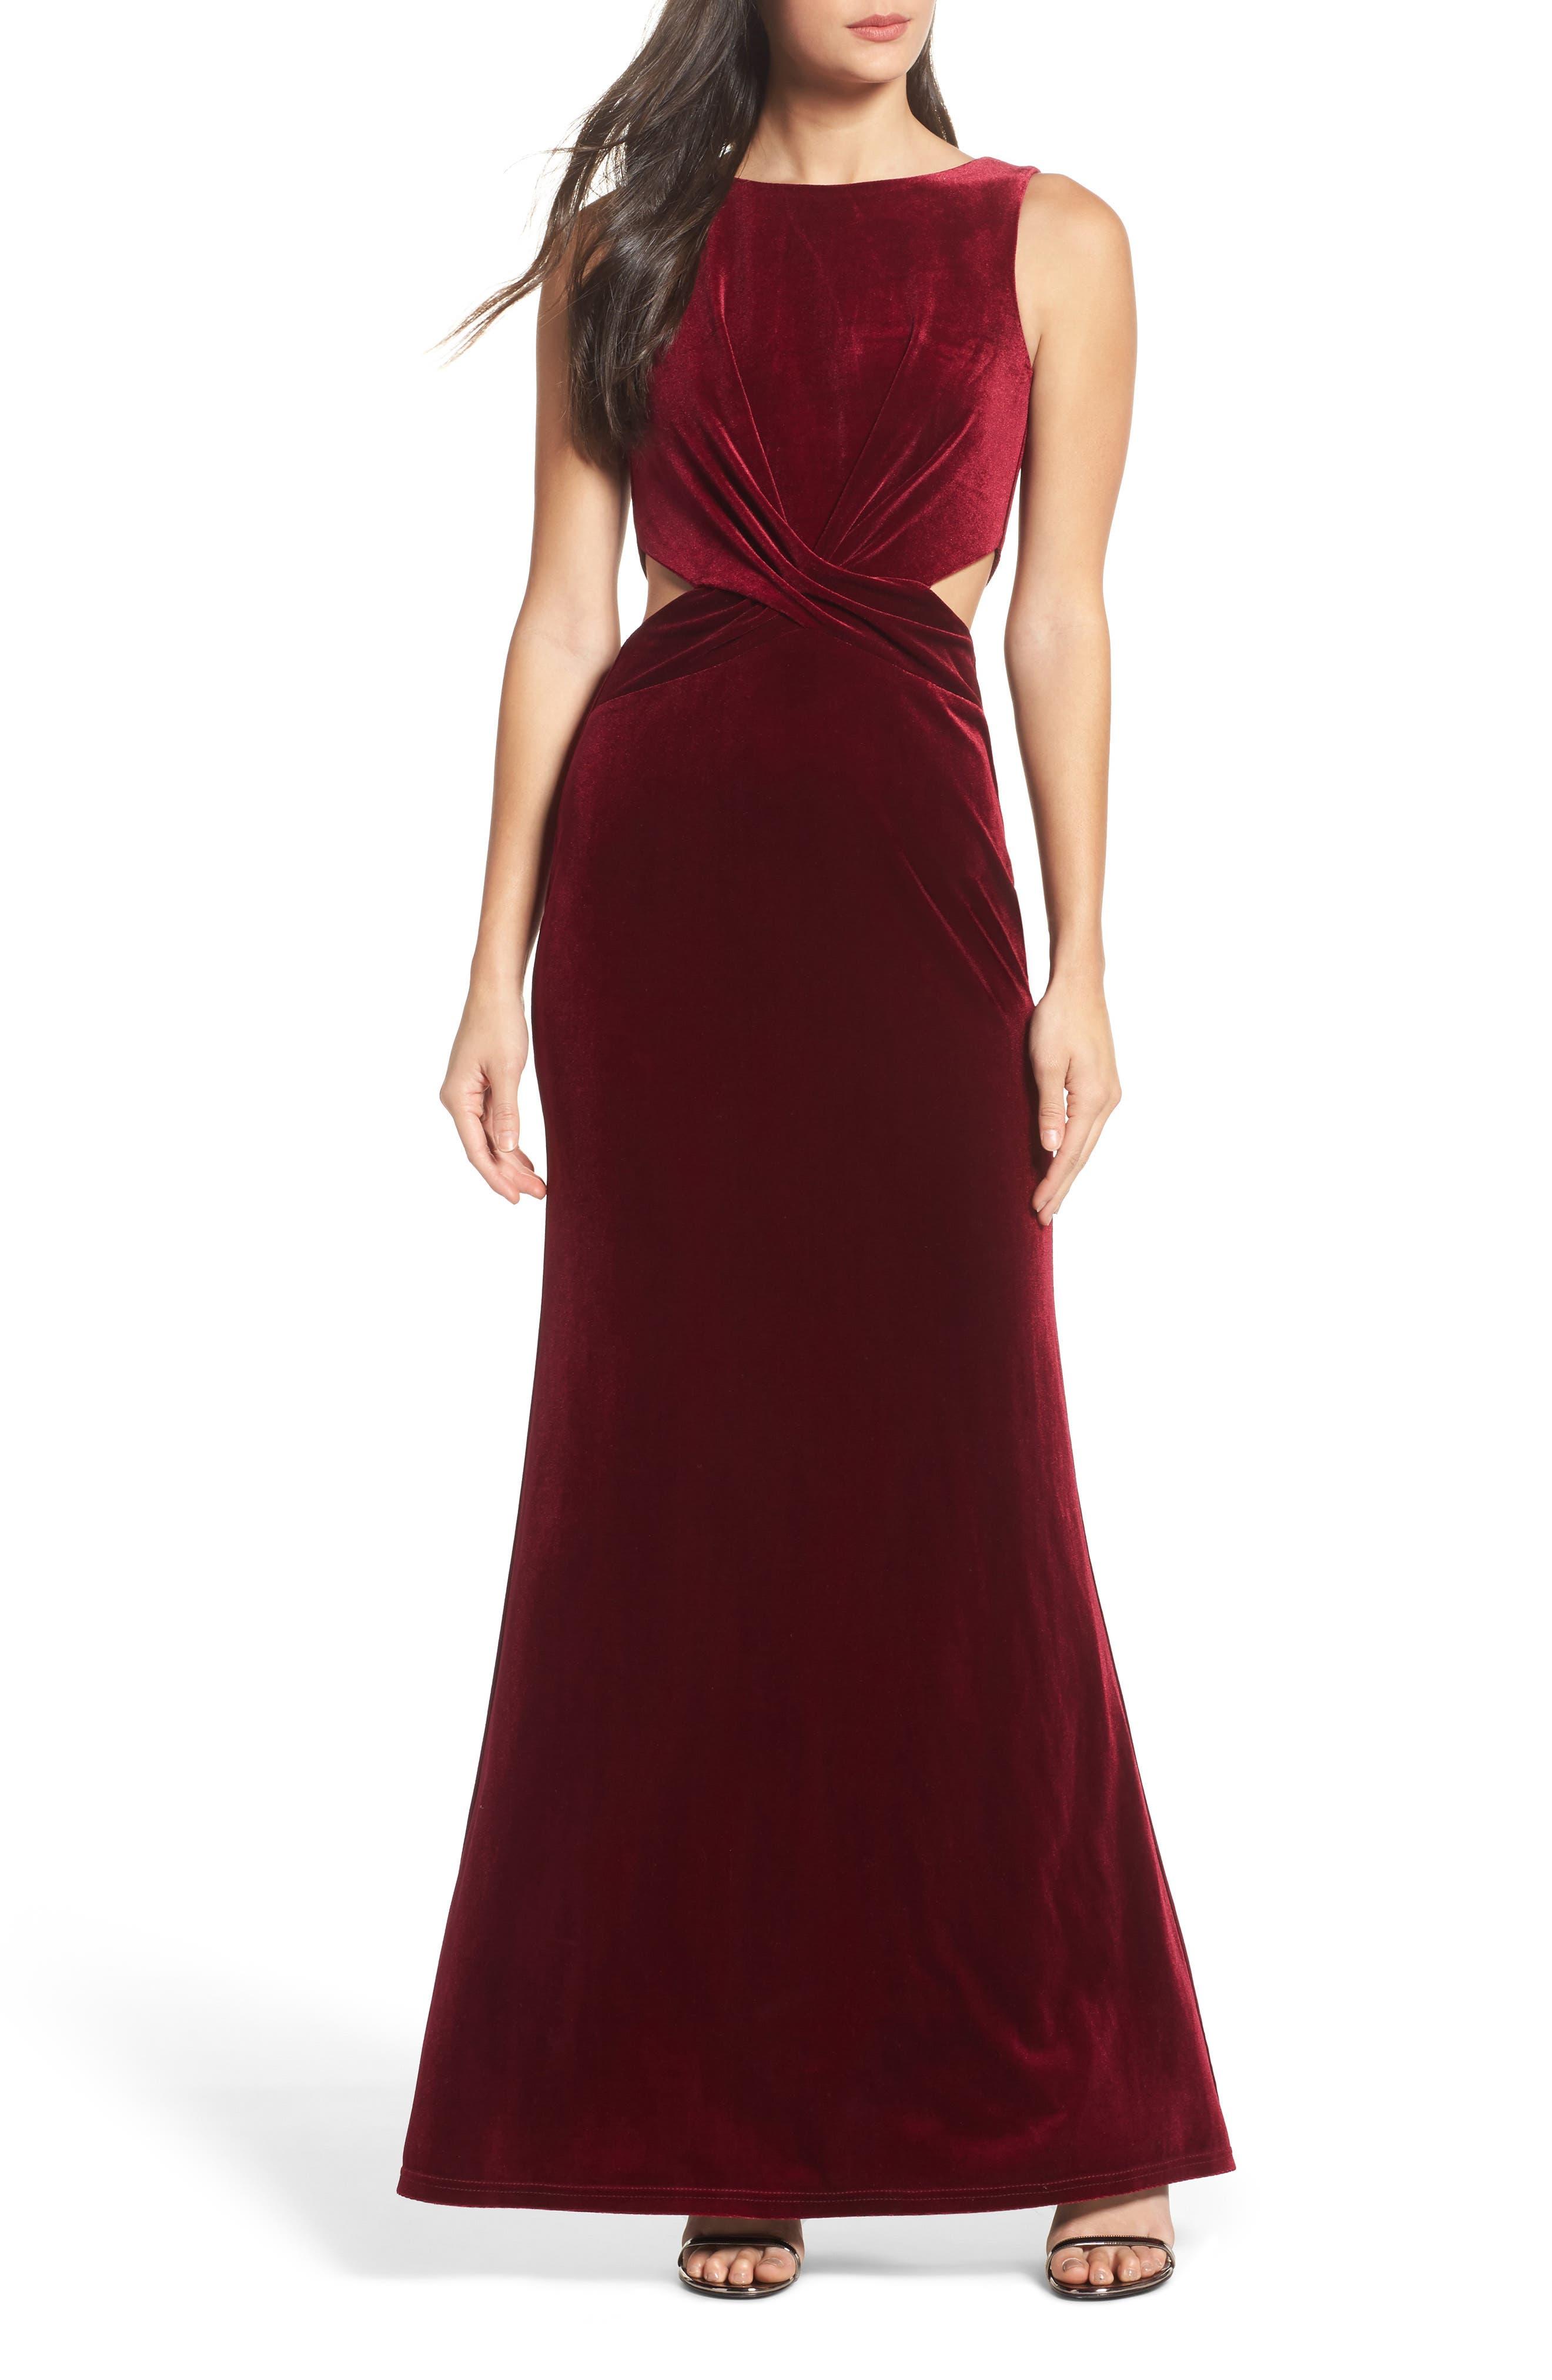 Reach Out Velvet Maxi Dress,                         Main,                         color, Burgundy